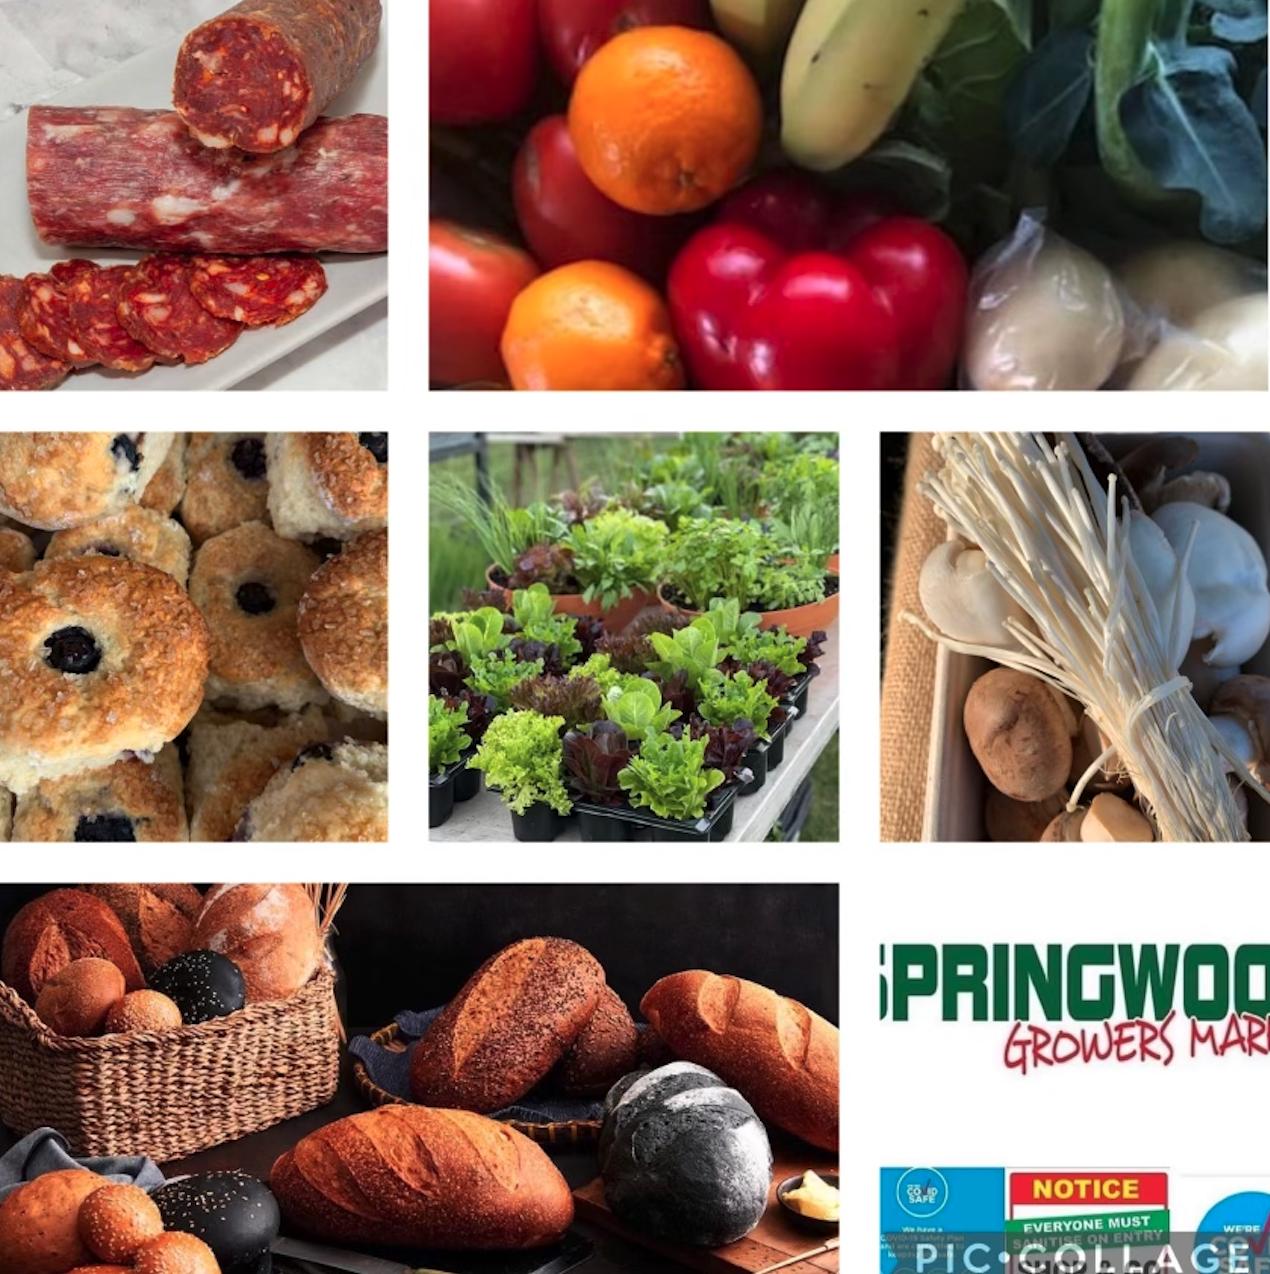 Springwood Growers Market